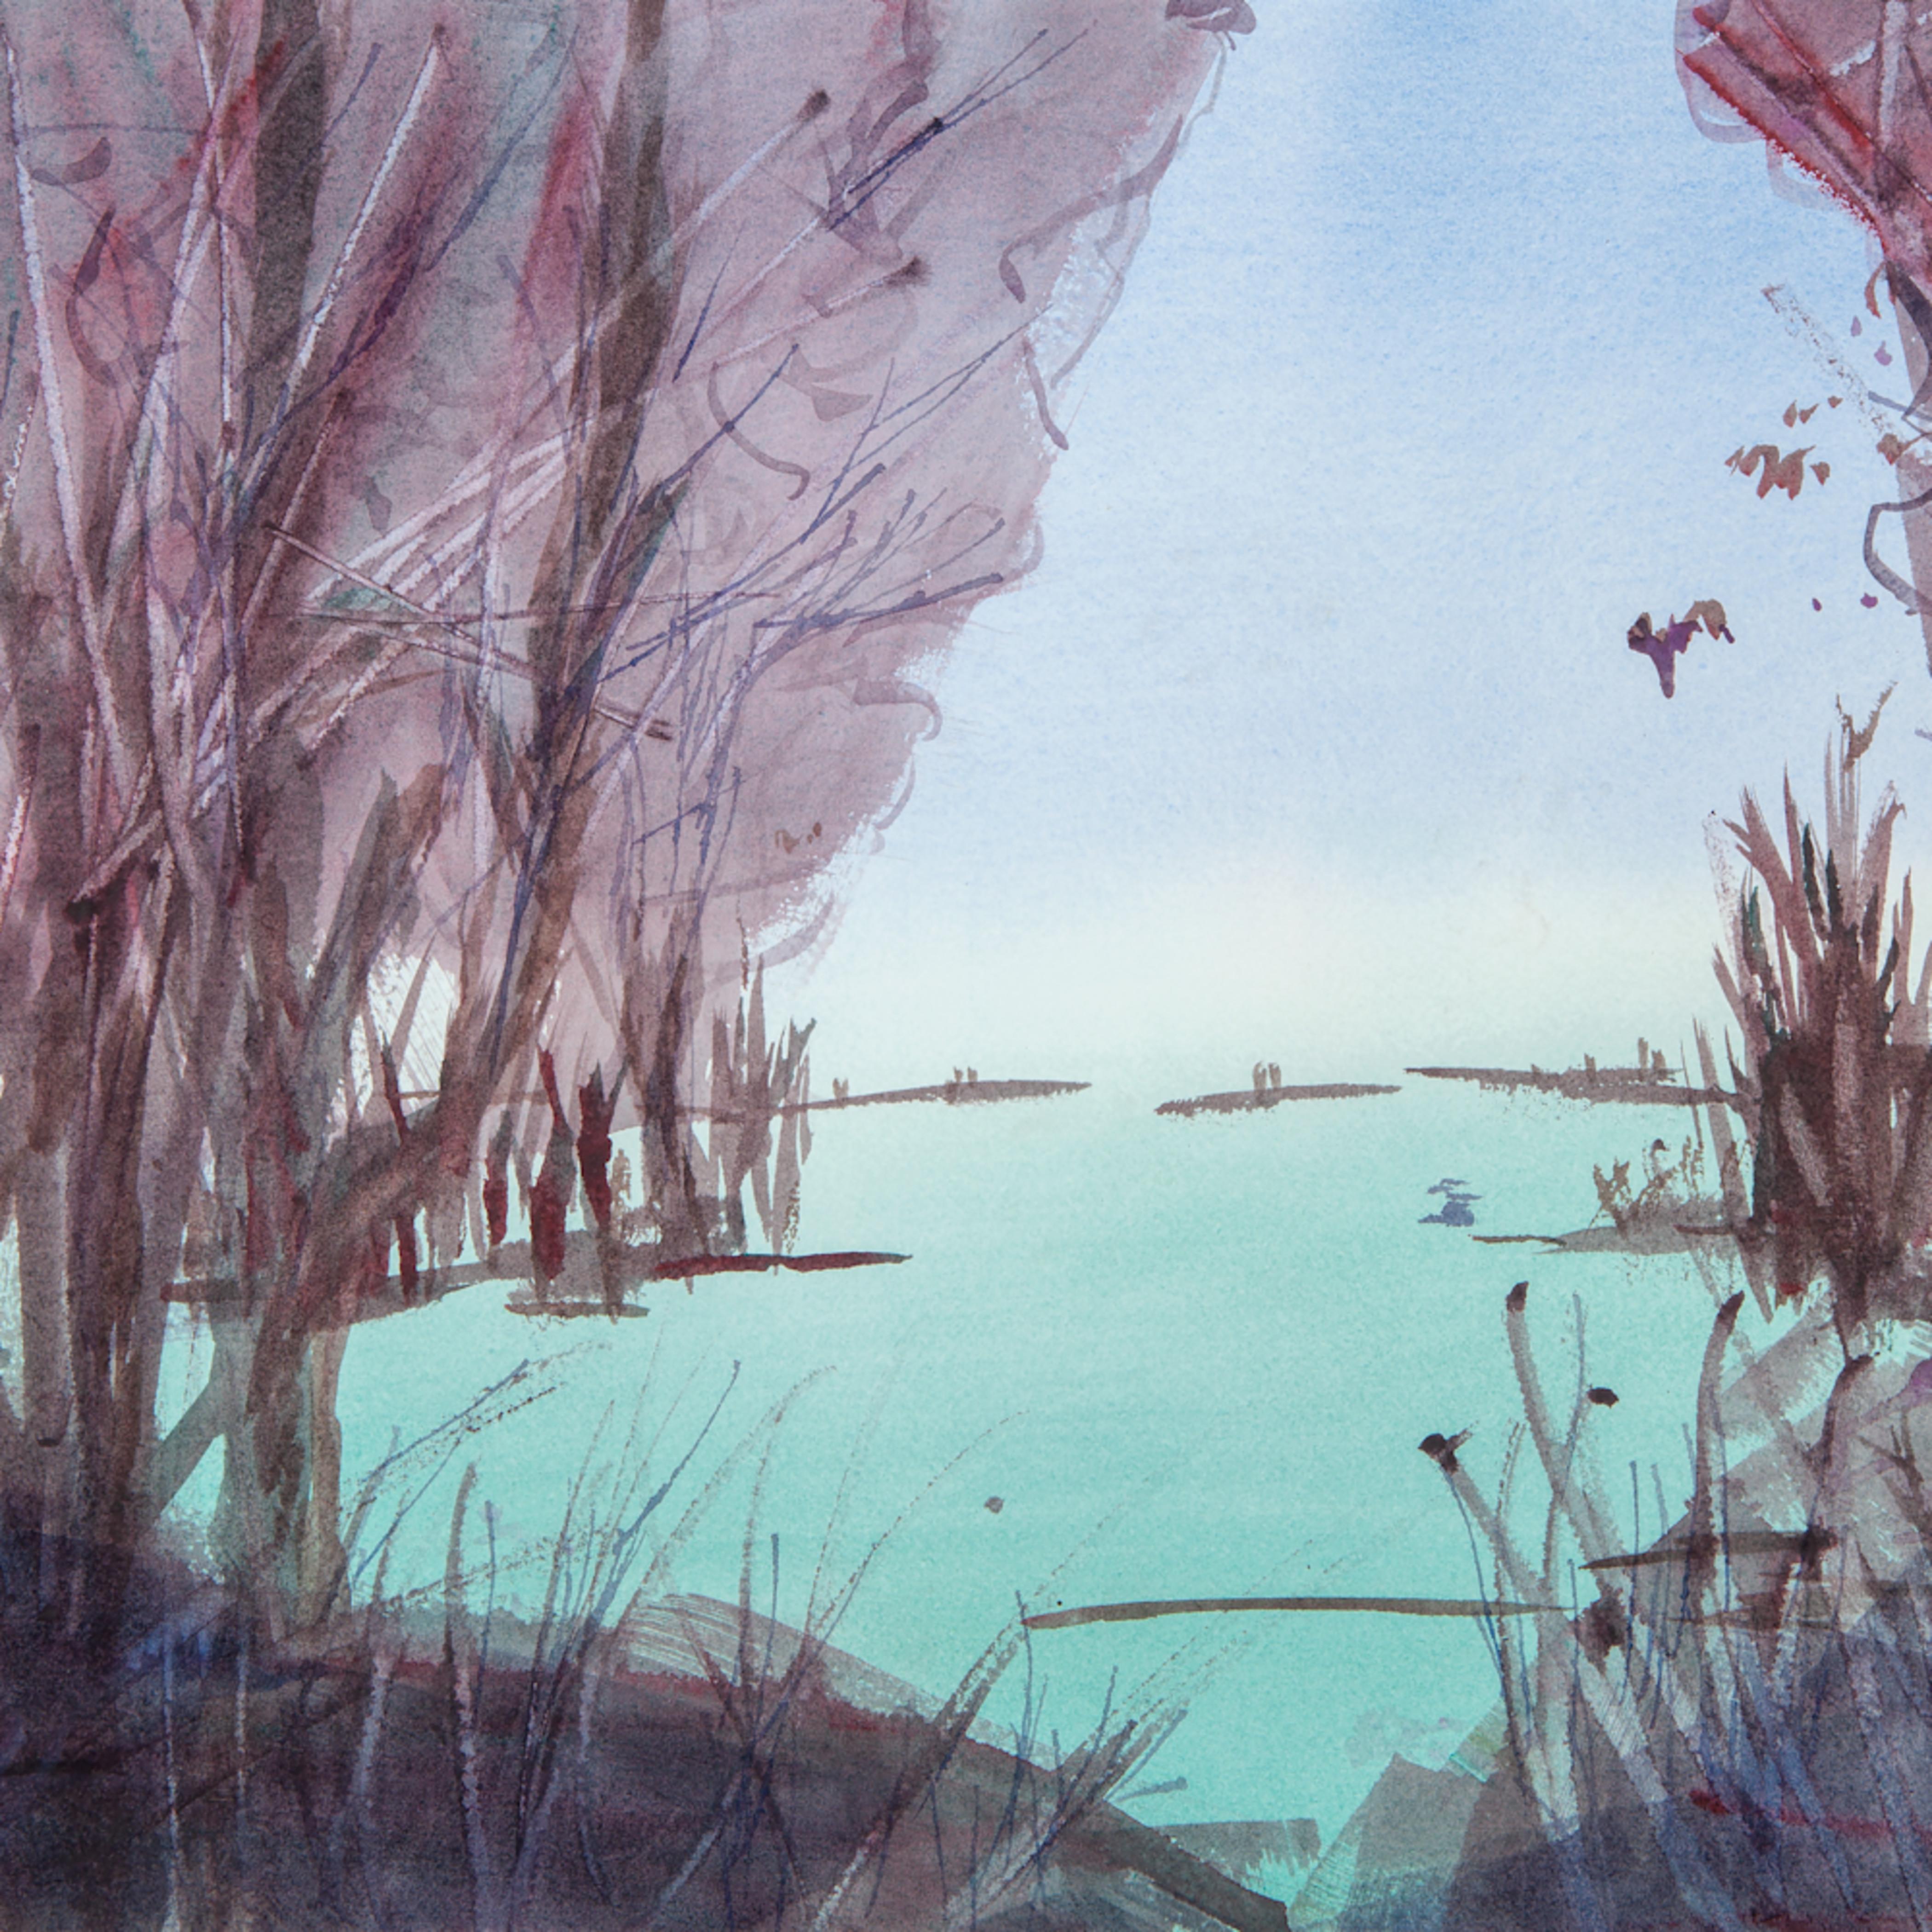 Marsh leygkd